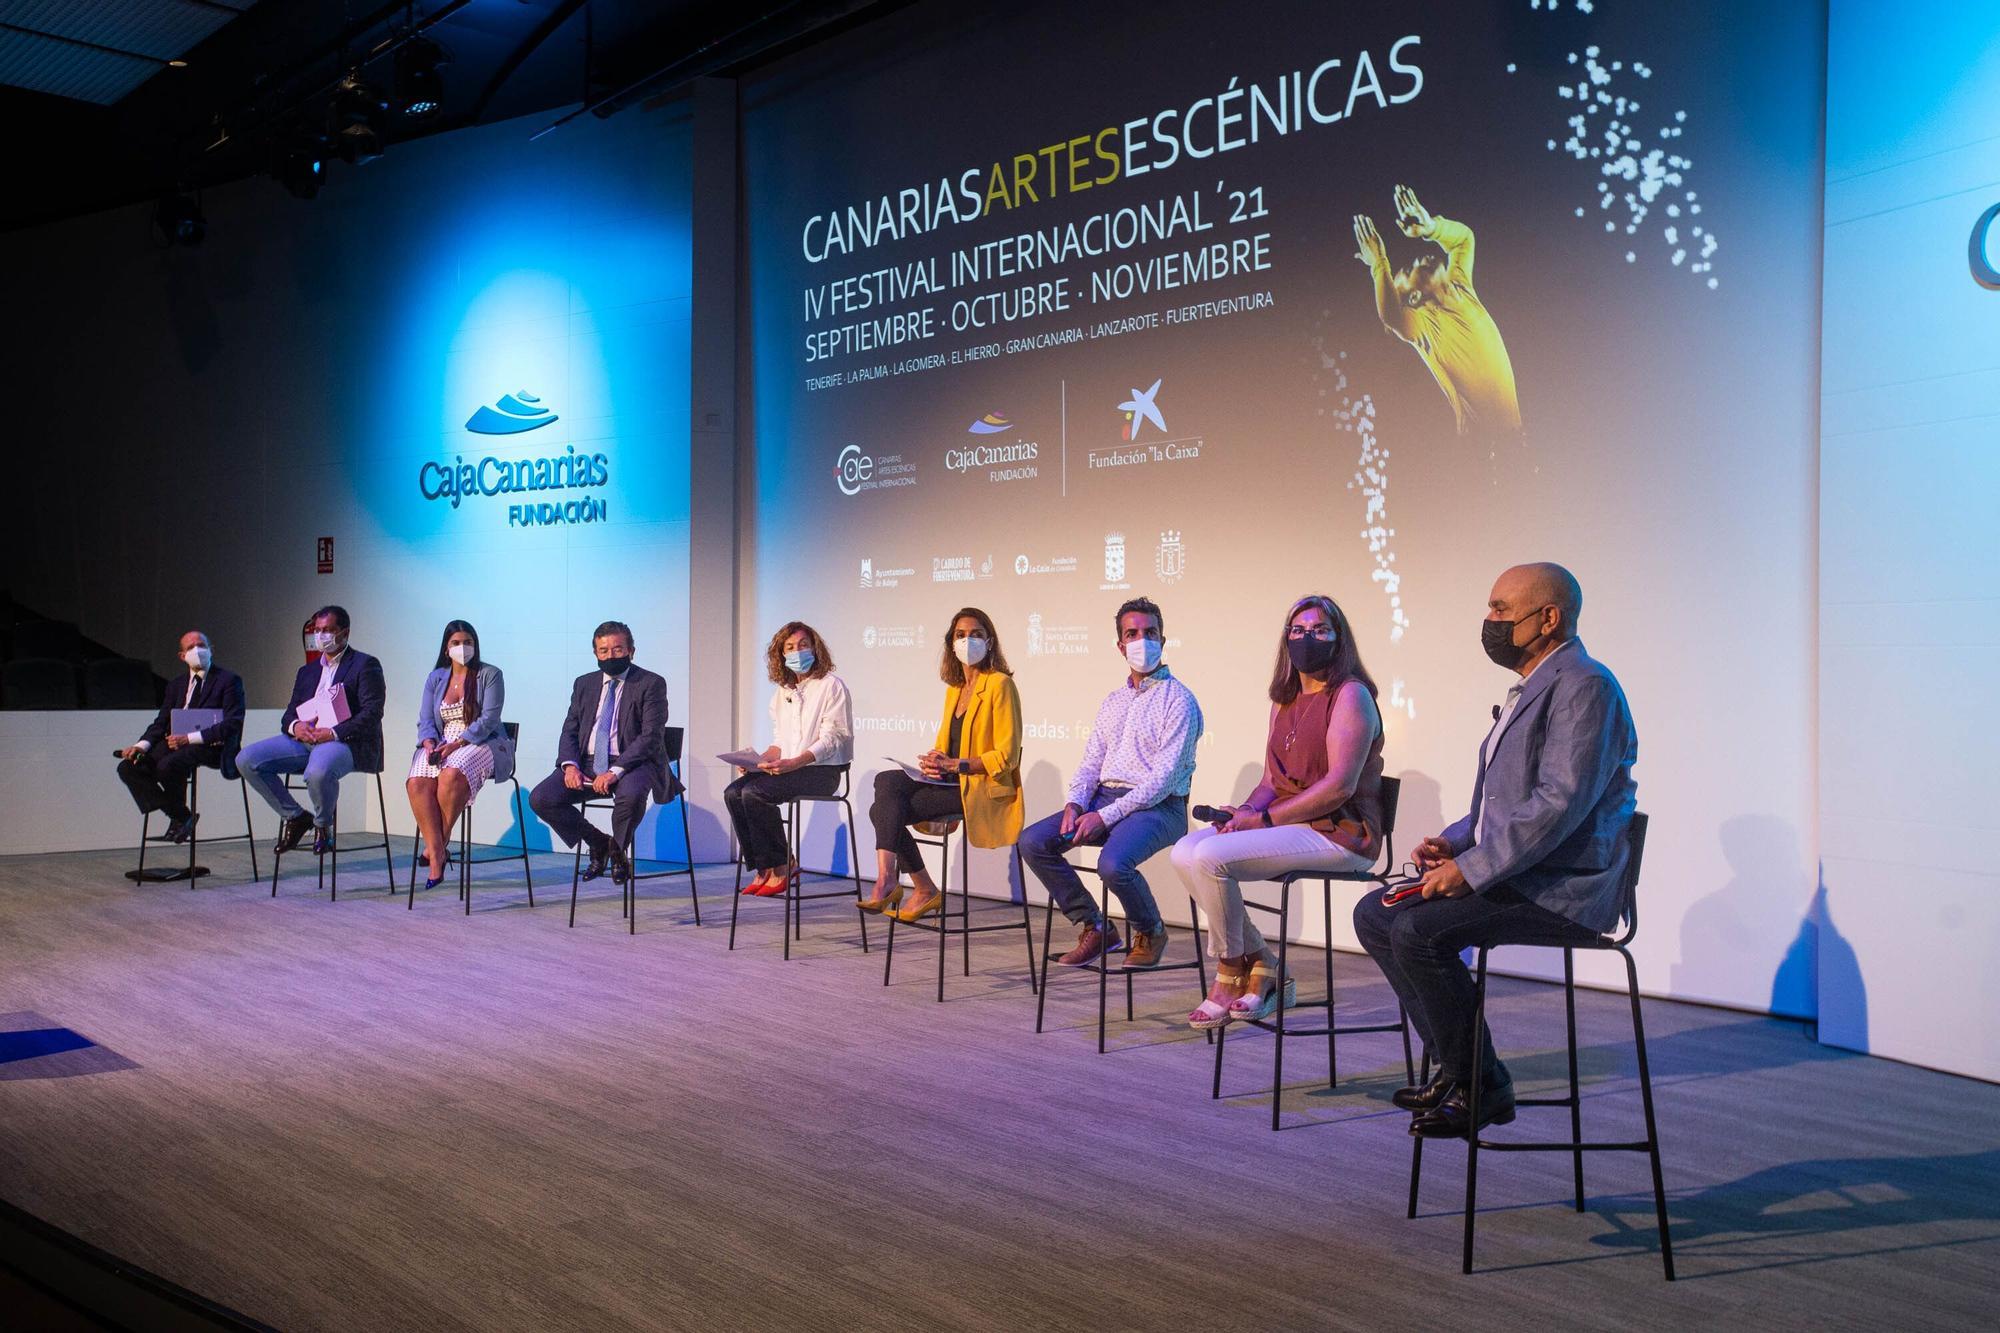 Festival Canarias Artes Escénicas